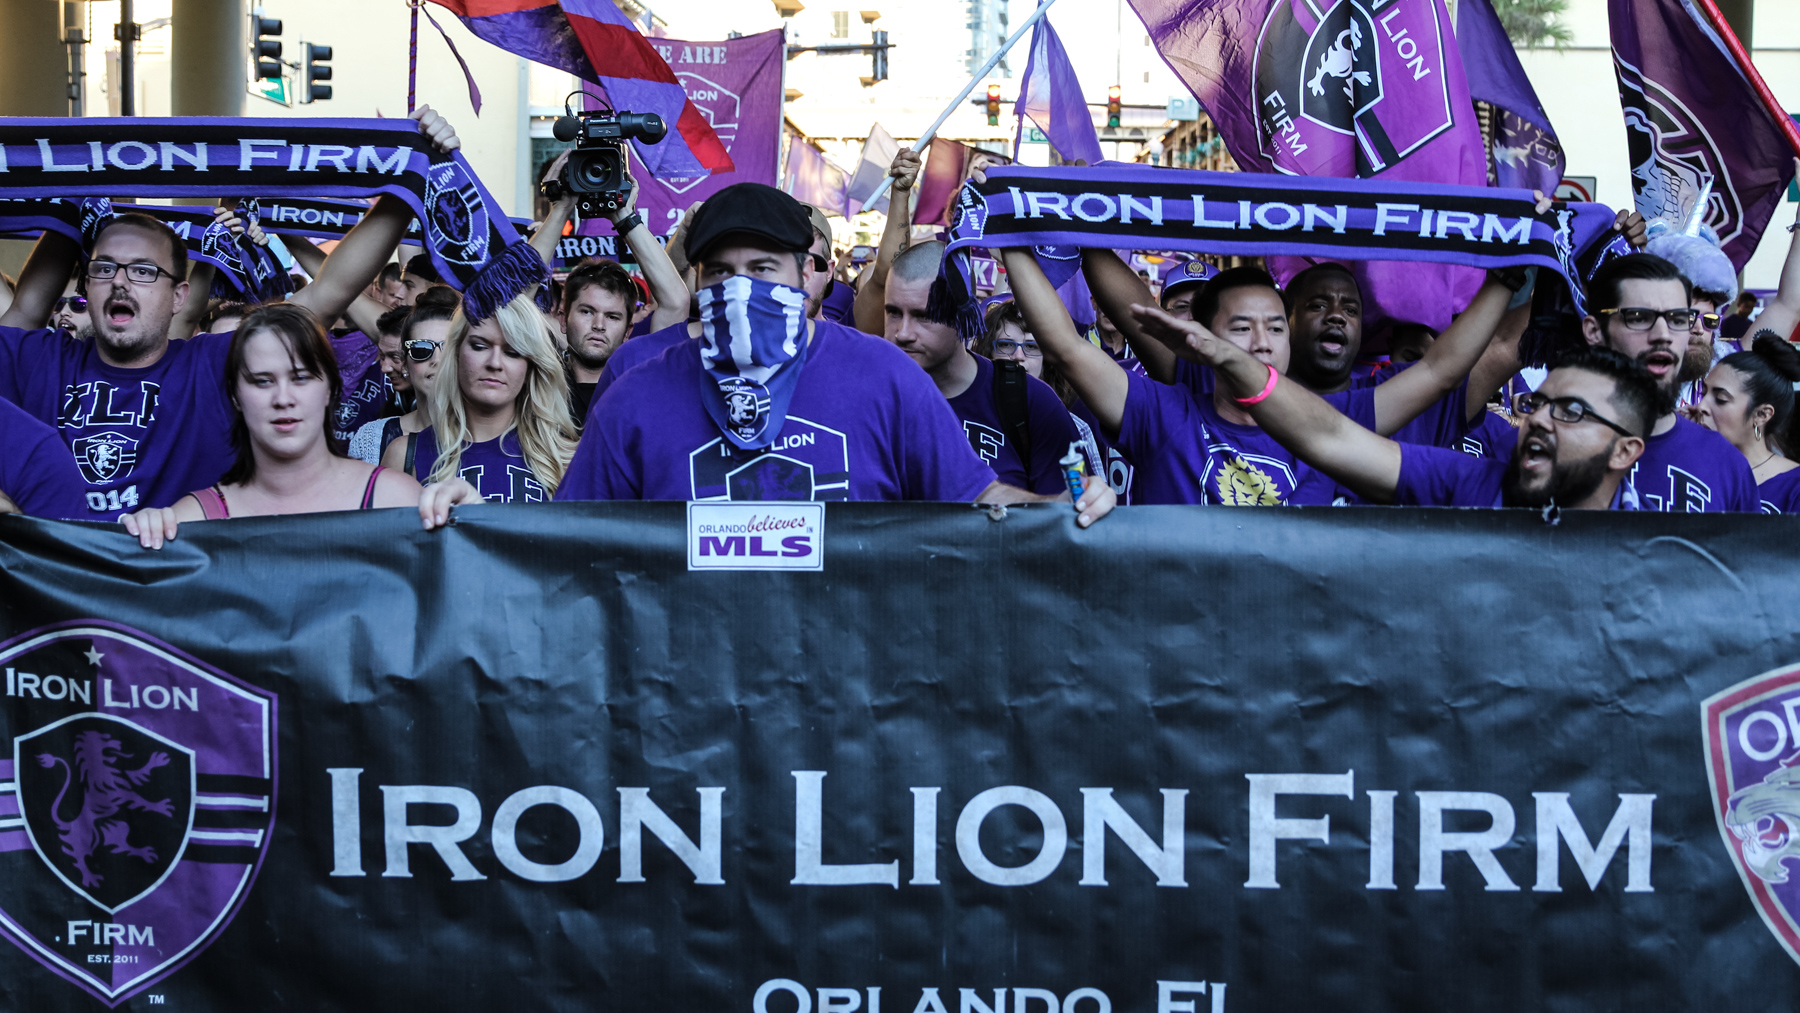 orlando soccer, soccer city, orlando city soccer, orlando city, usa soccer, soccer world cup, us soccer, Iron lion firm, iron lion, soccer club